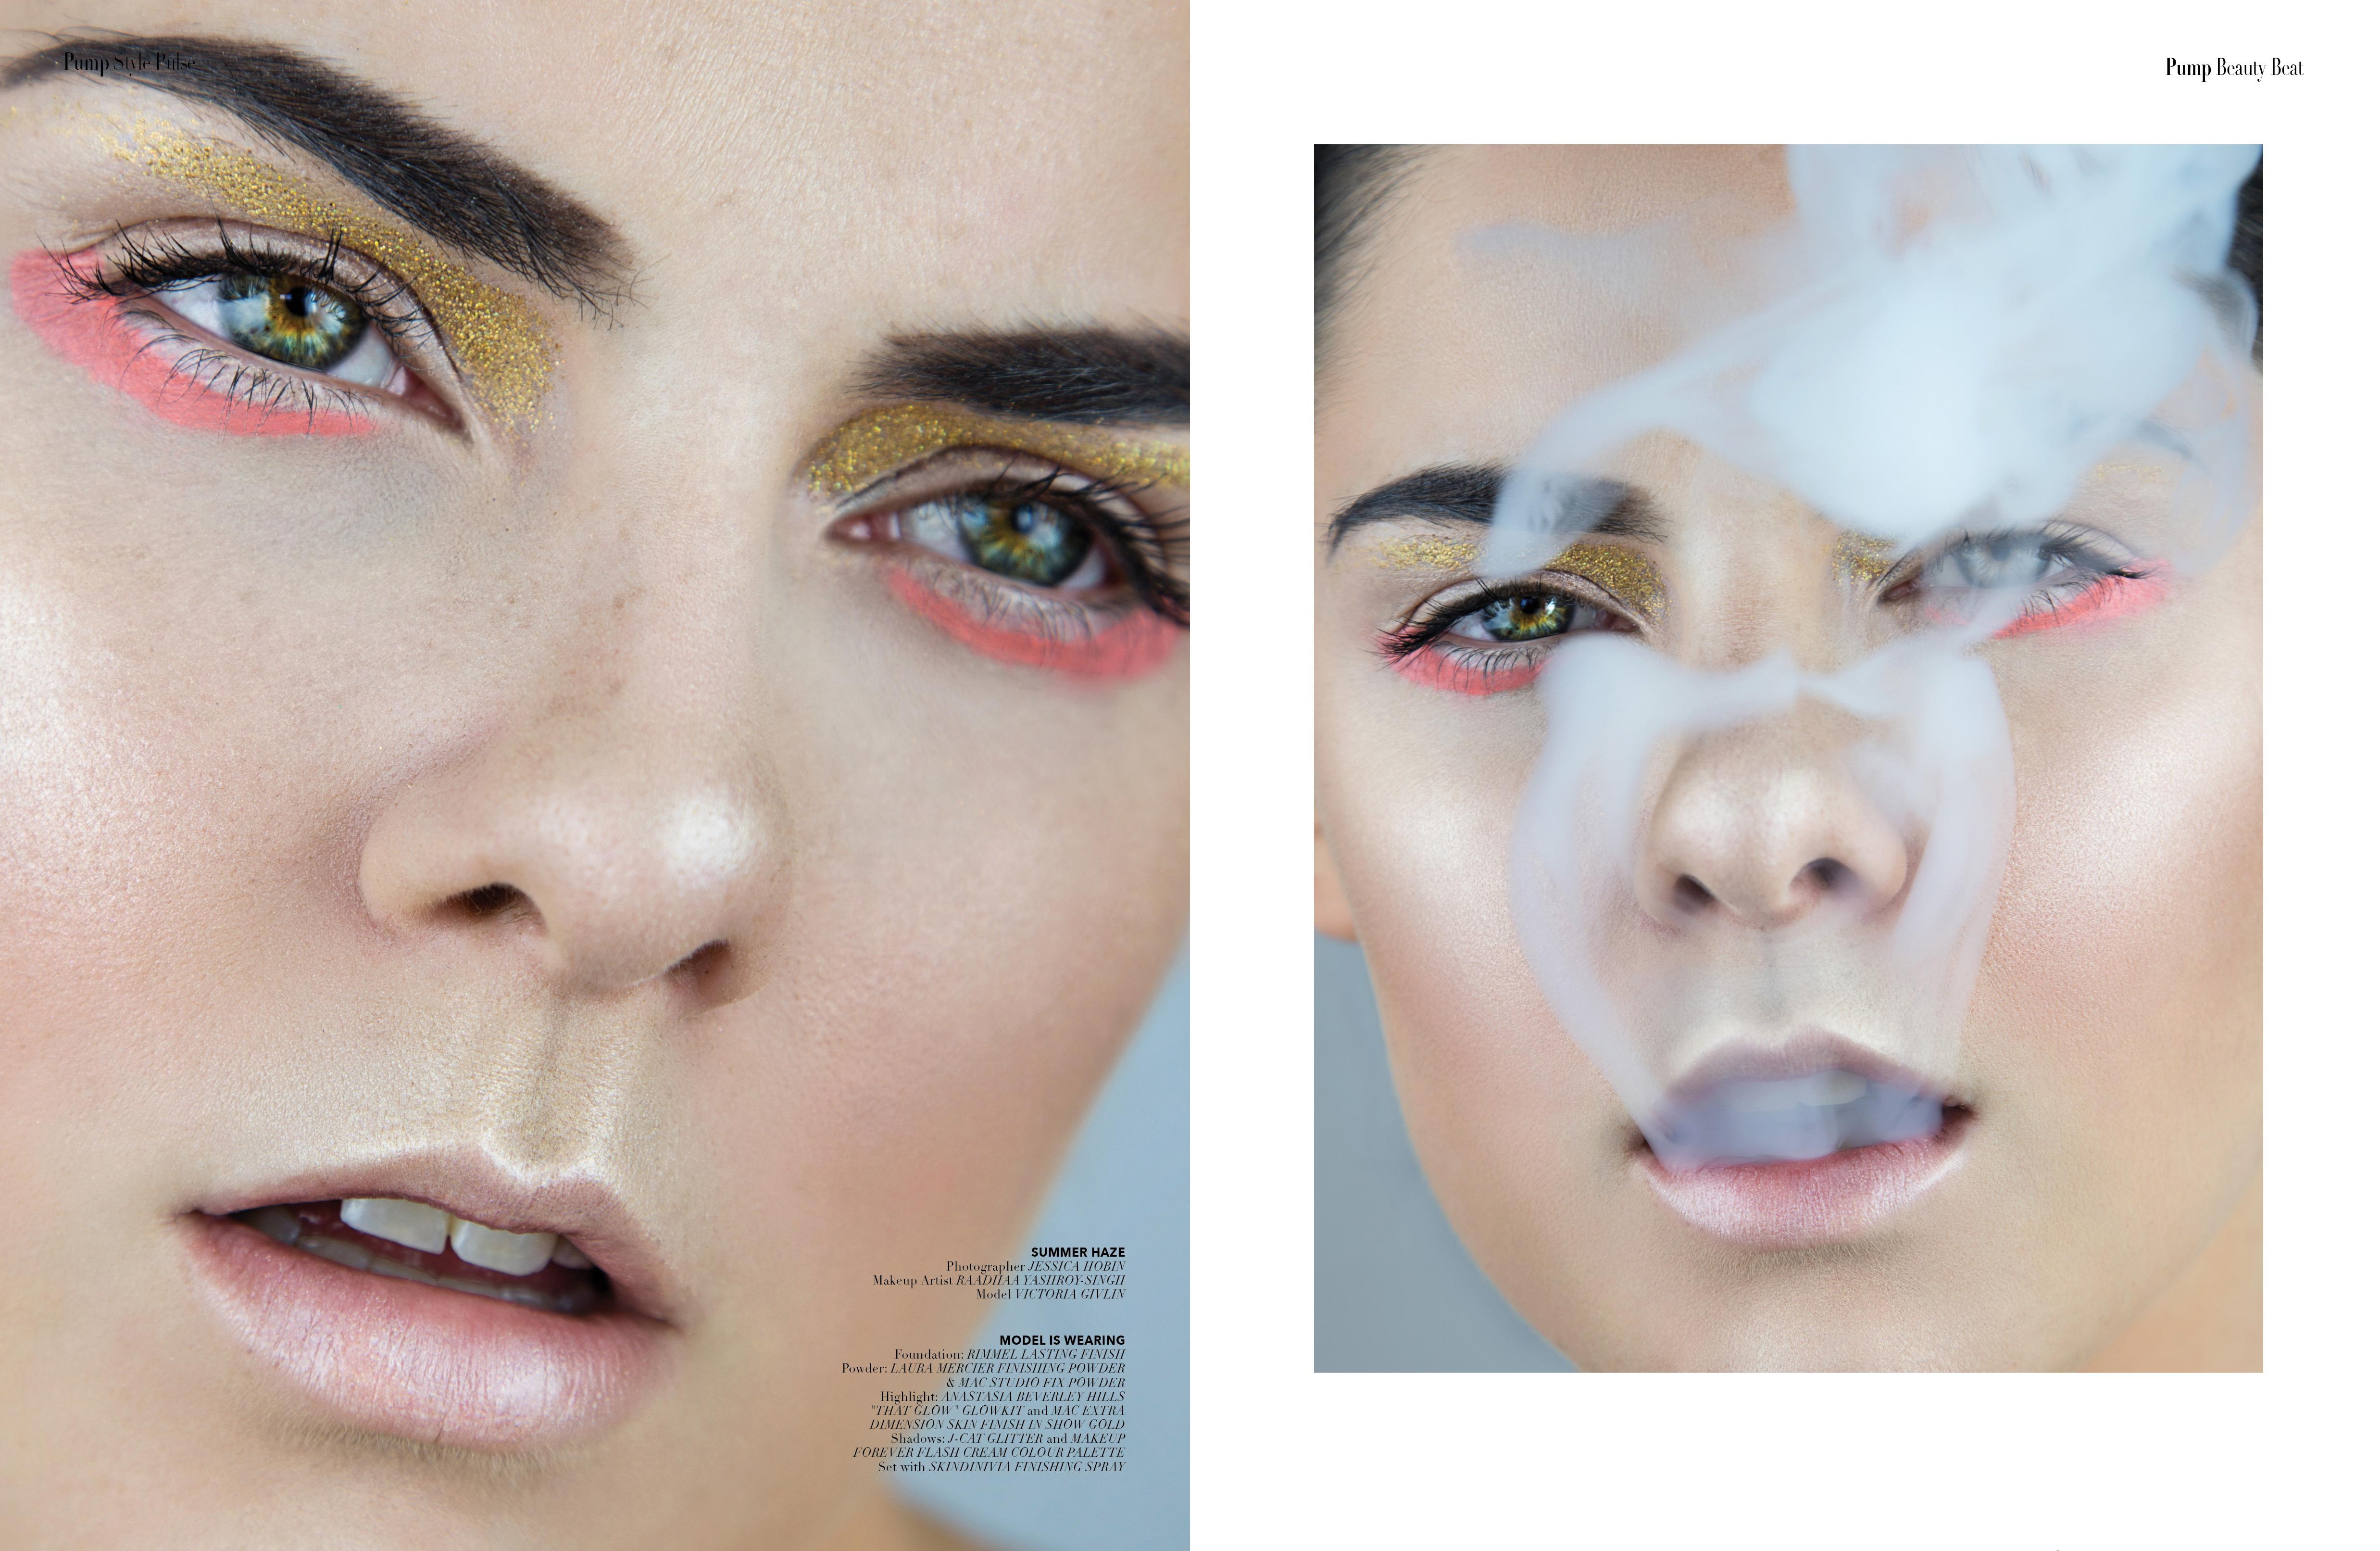 PUMP Magazine - Summer Haze